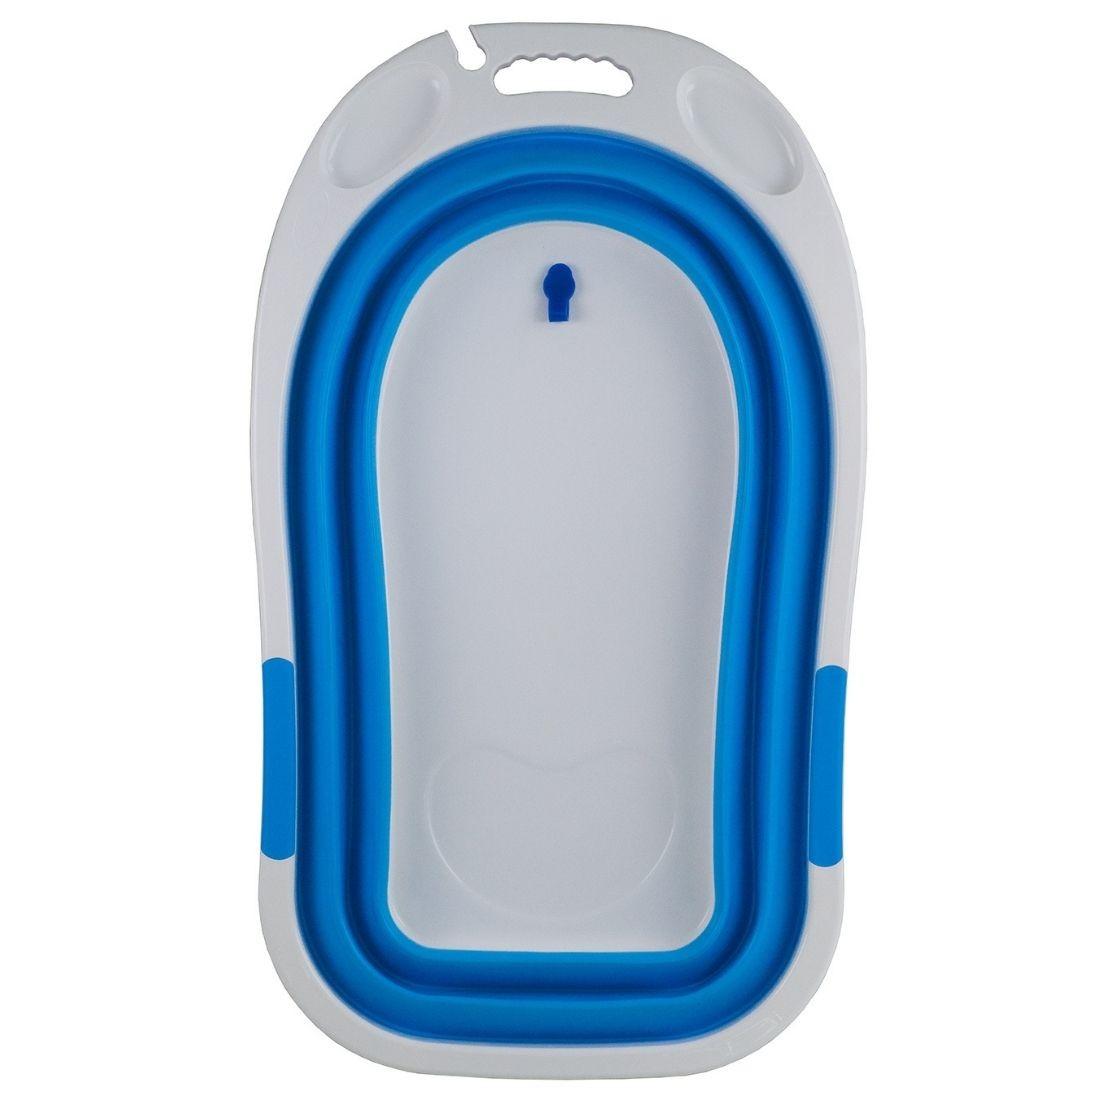 Banheira Dobravel Clean Azul Baby Style